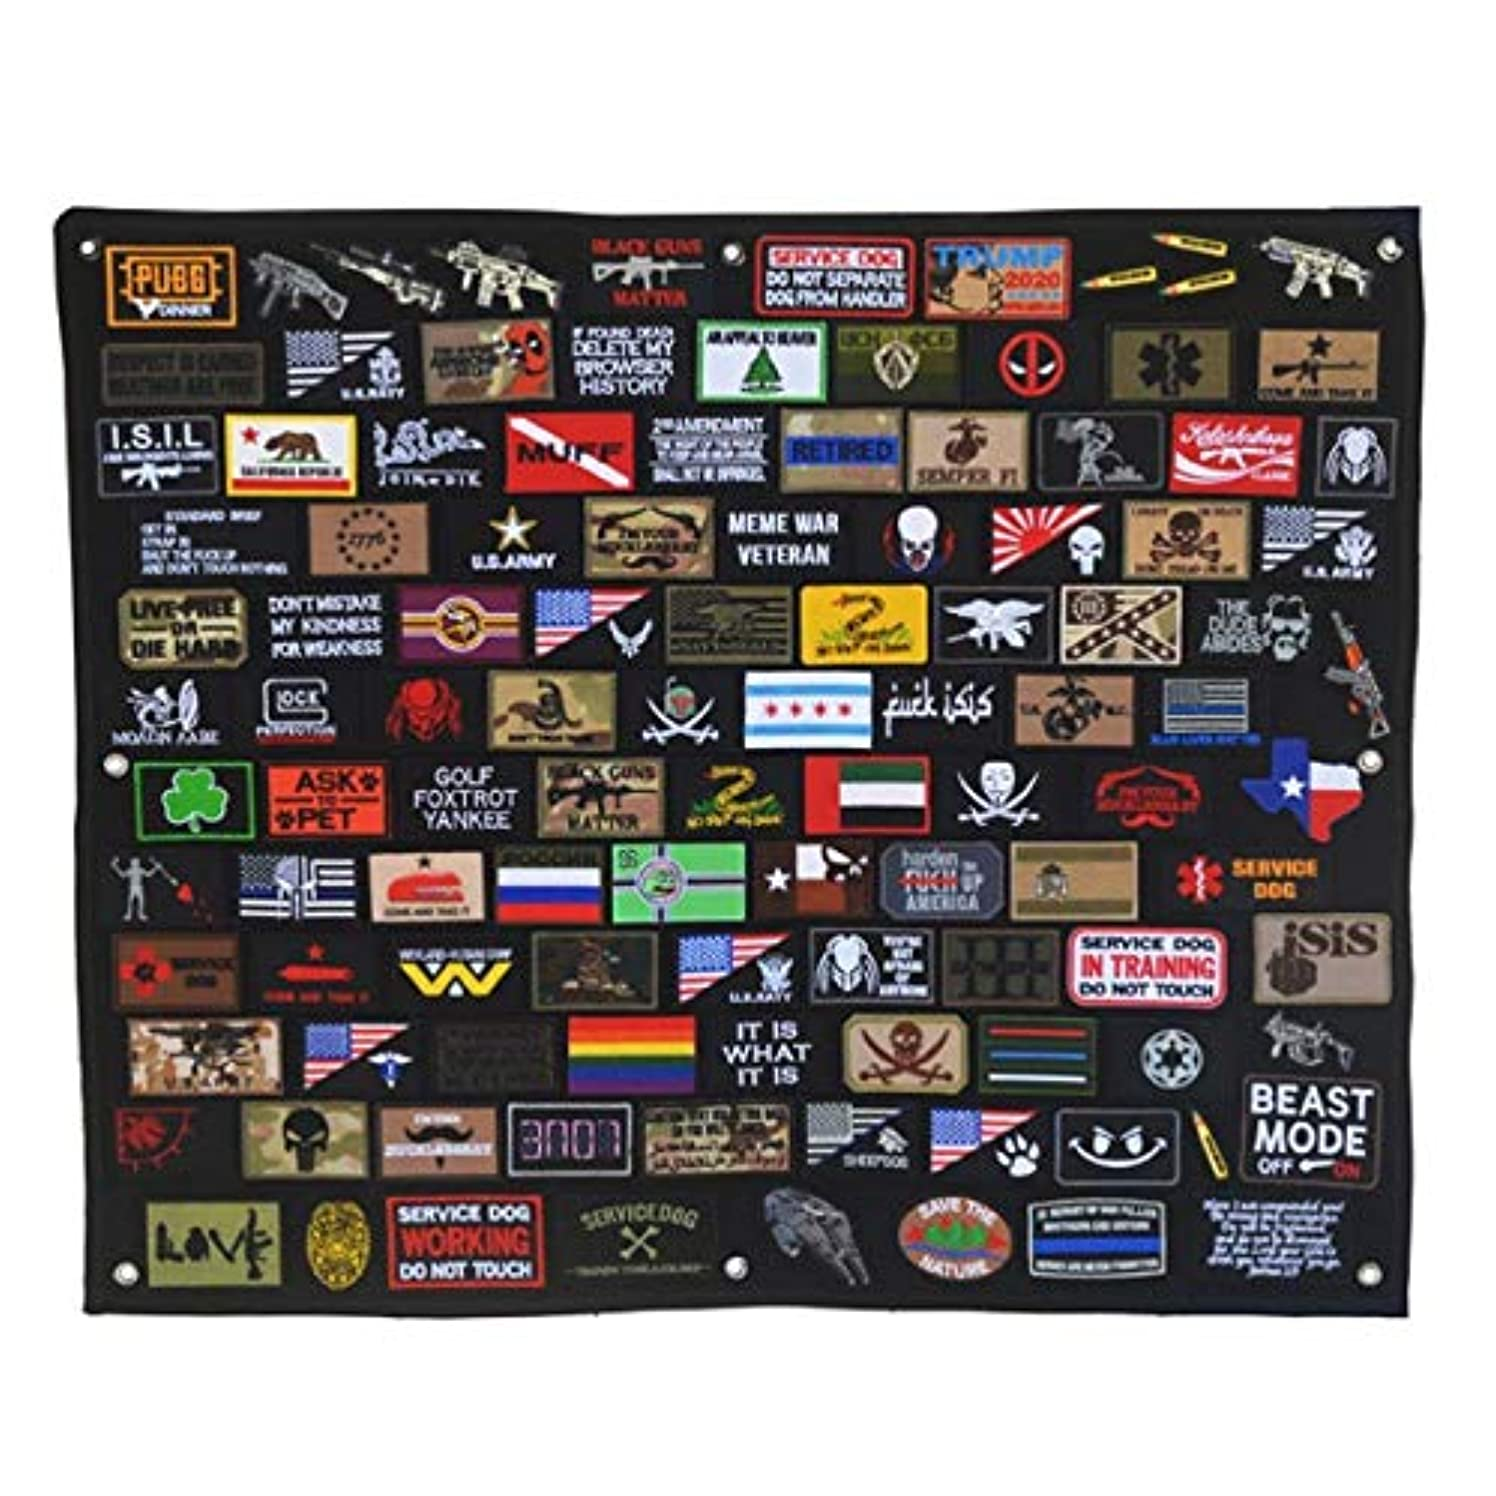 HotVinds Tactical Military Combat Morale Patch Holder Black Display Board 43.3